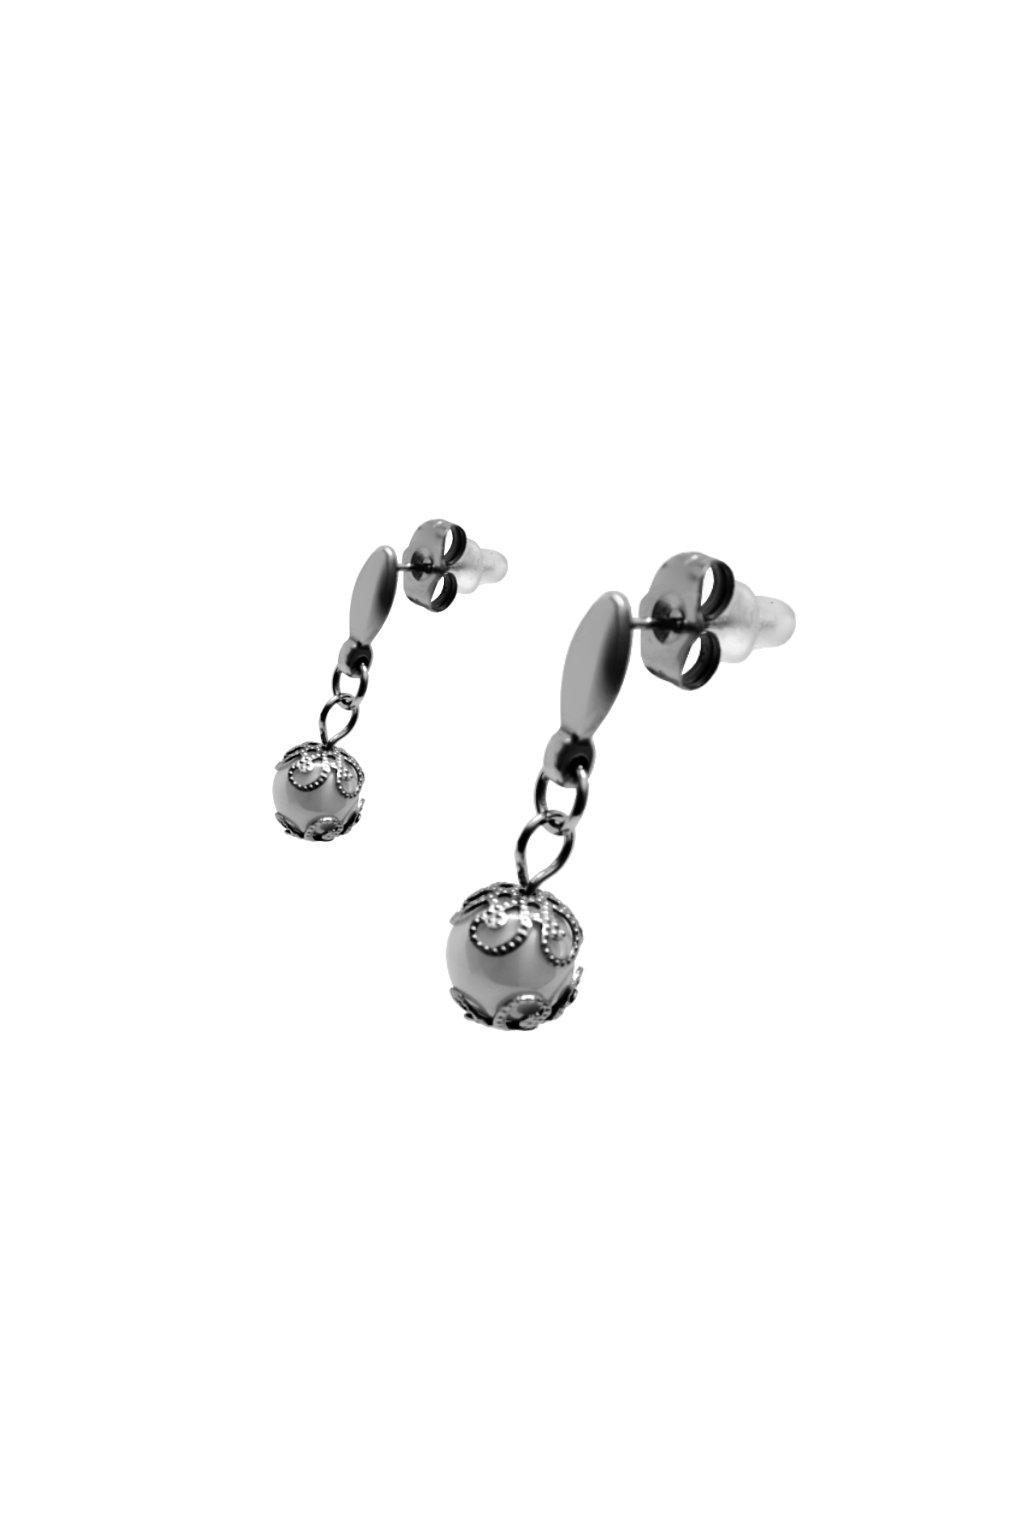 Skalimar Náušnice z chirurgické oceli KERAMICKÉ 614091/2